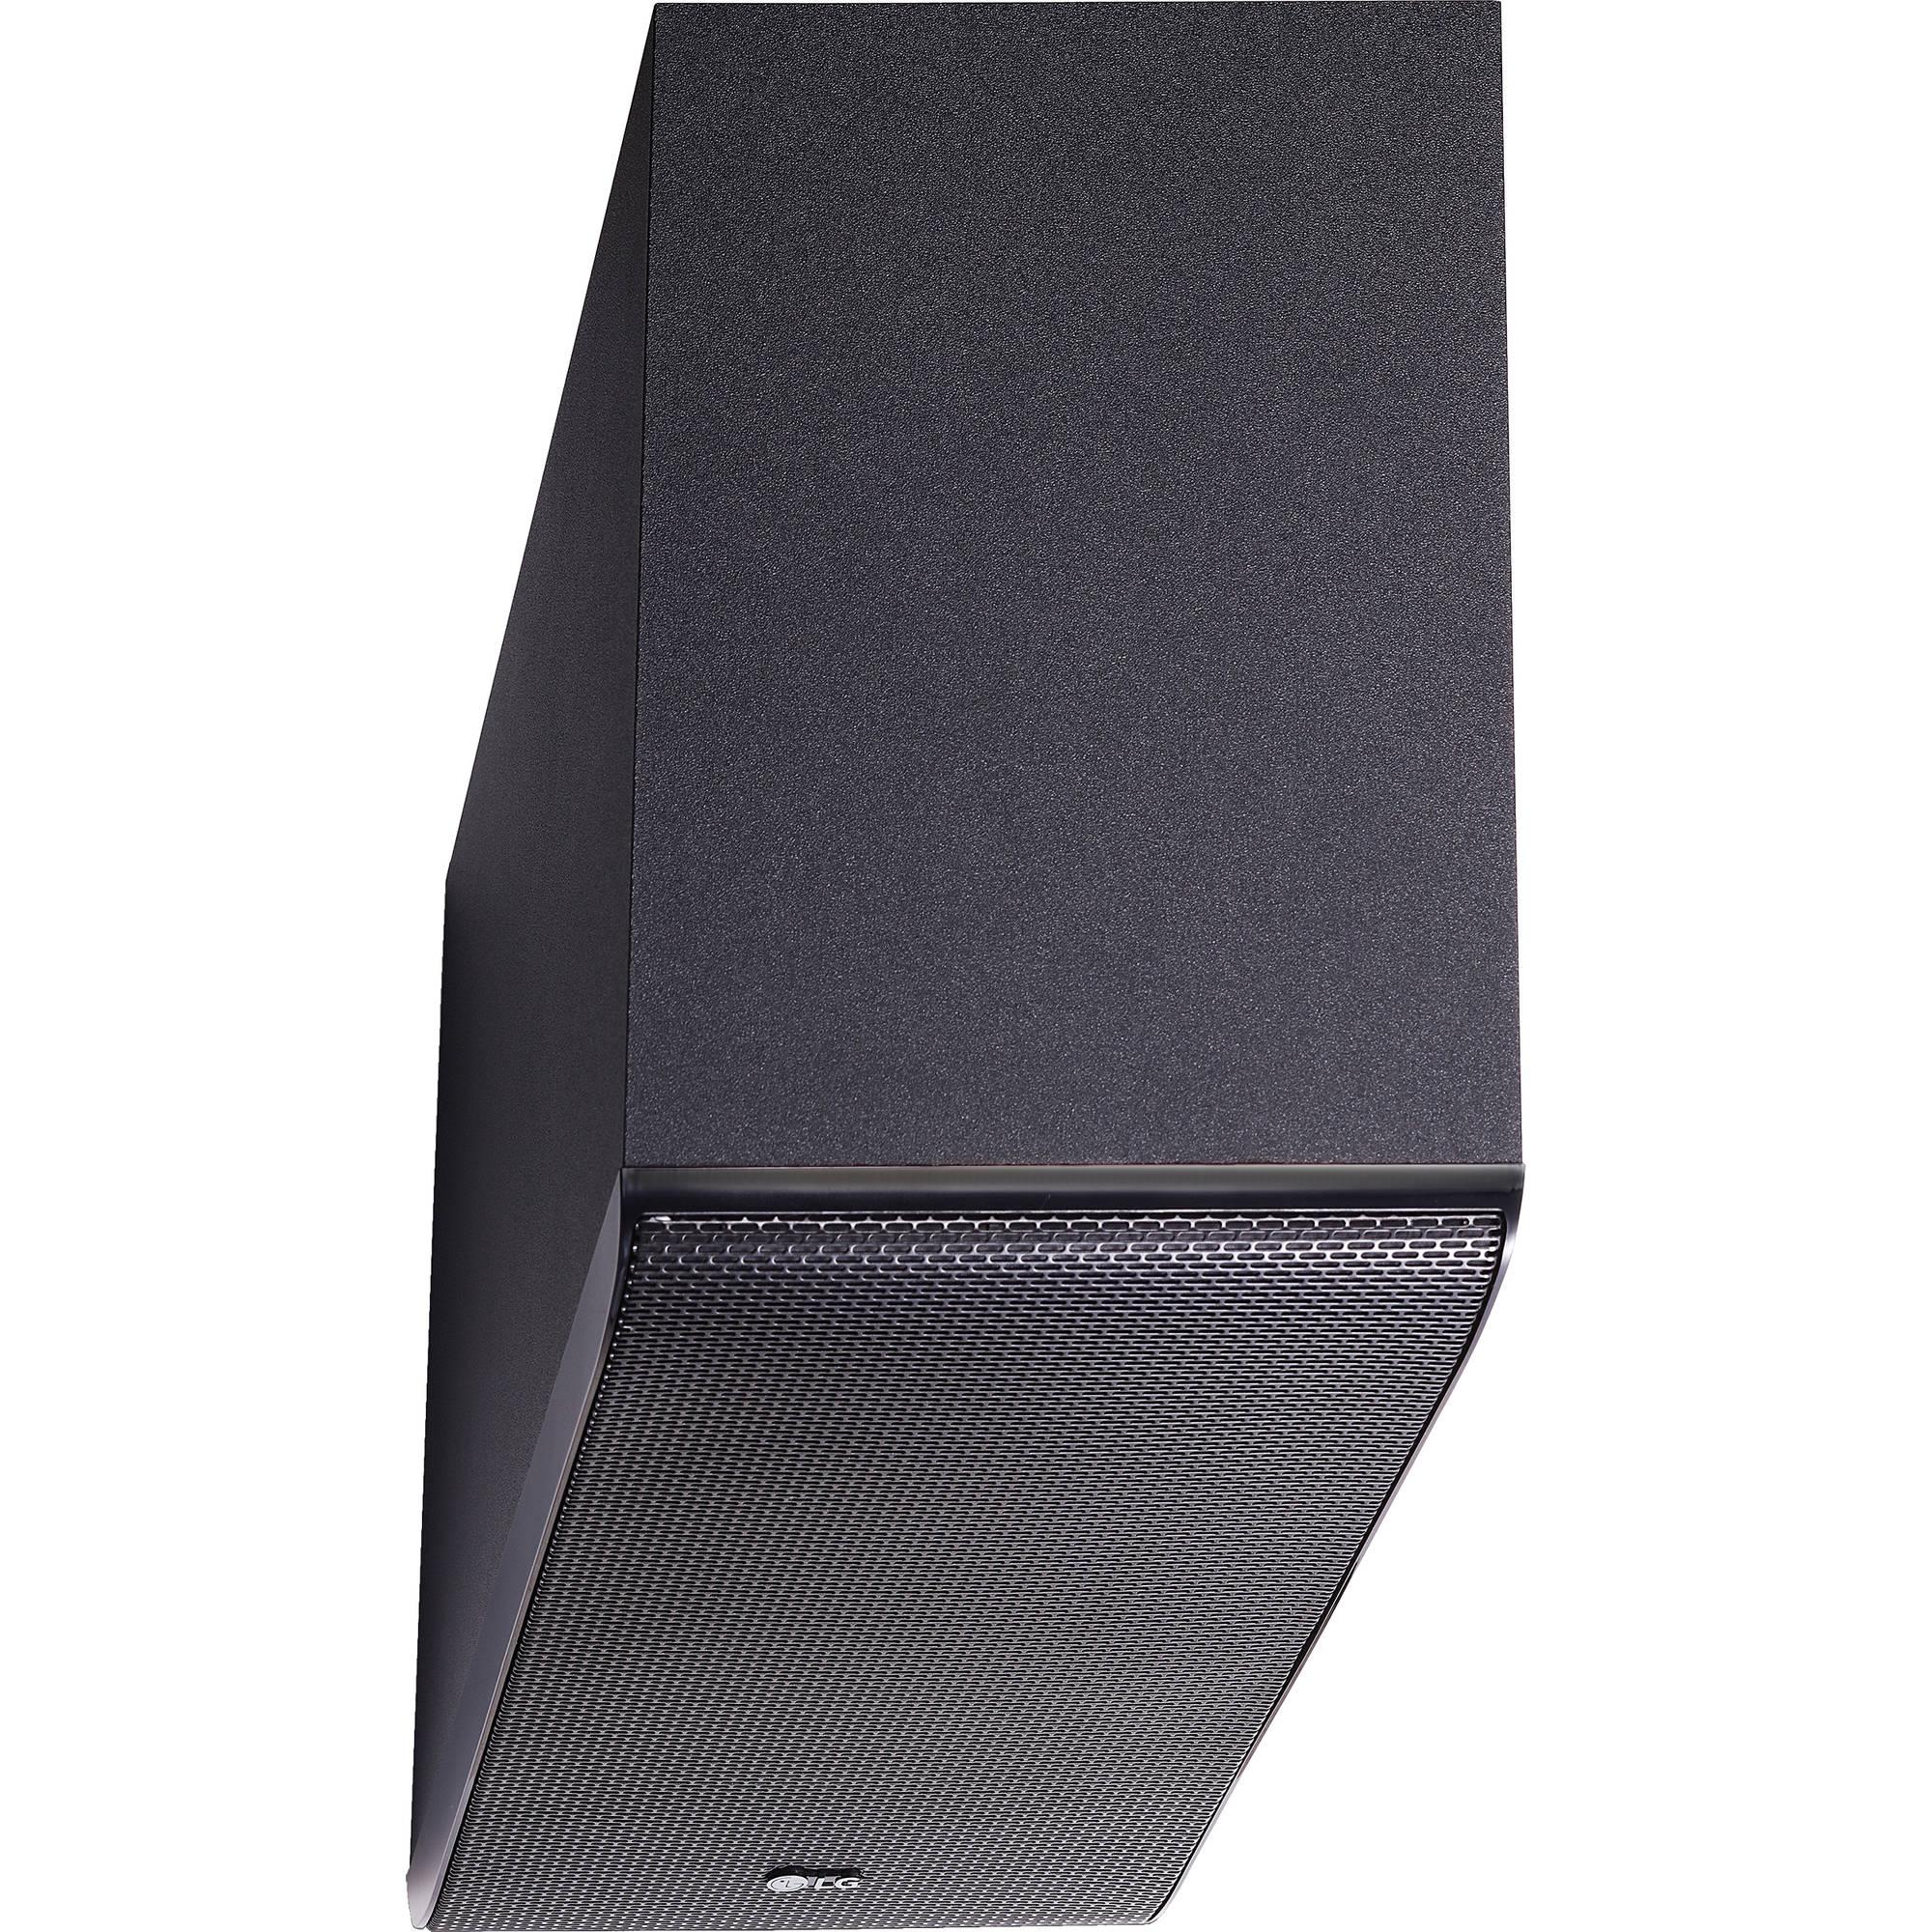 LG SJ8 300W 2 1-Channel Soundbar System